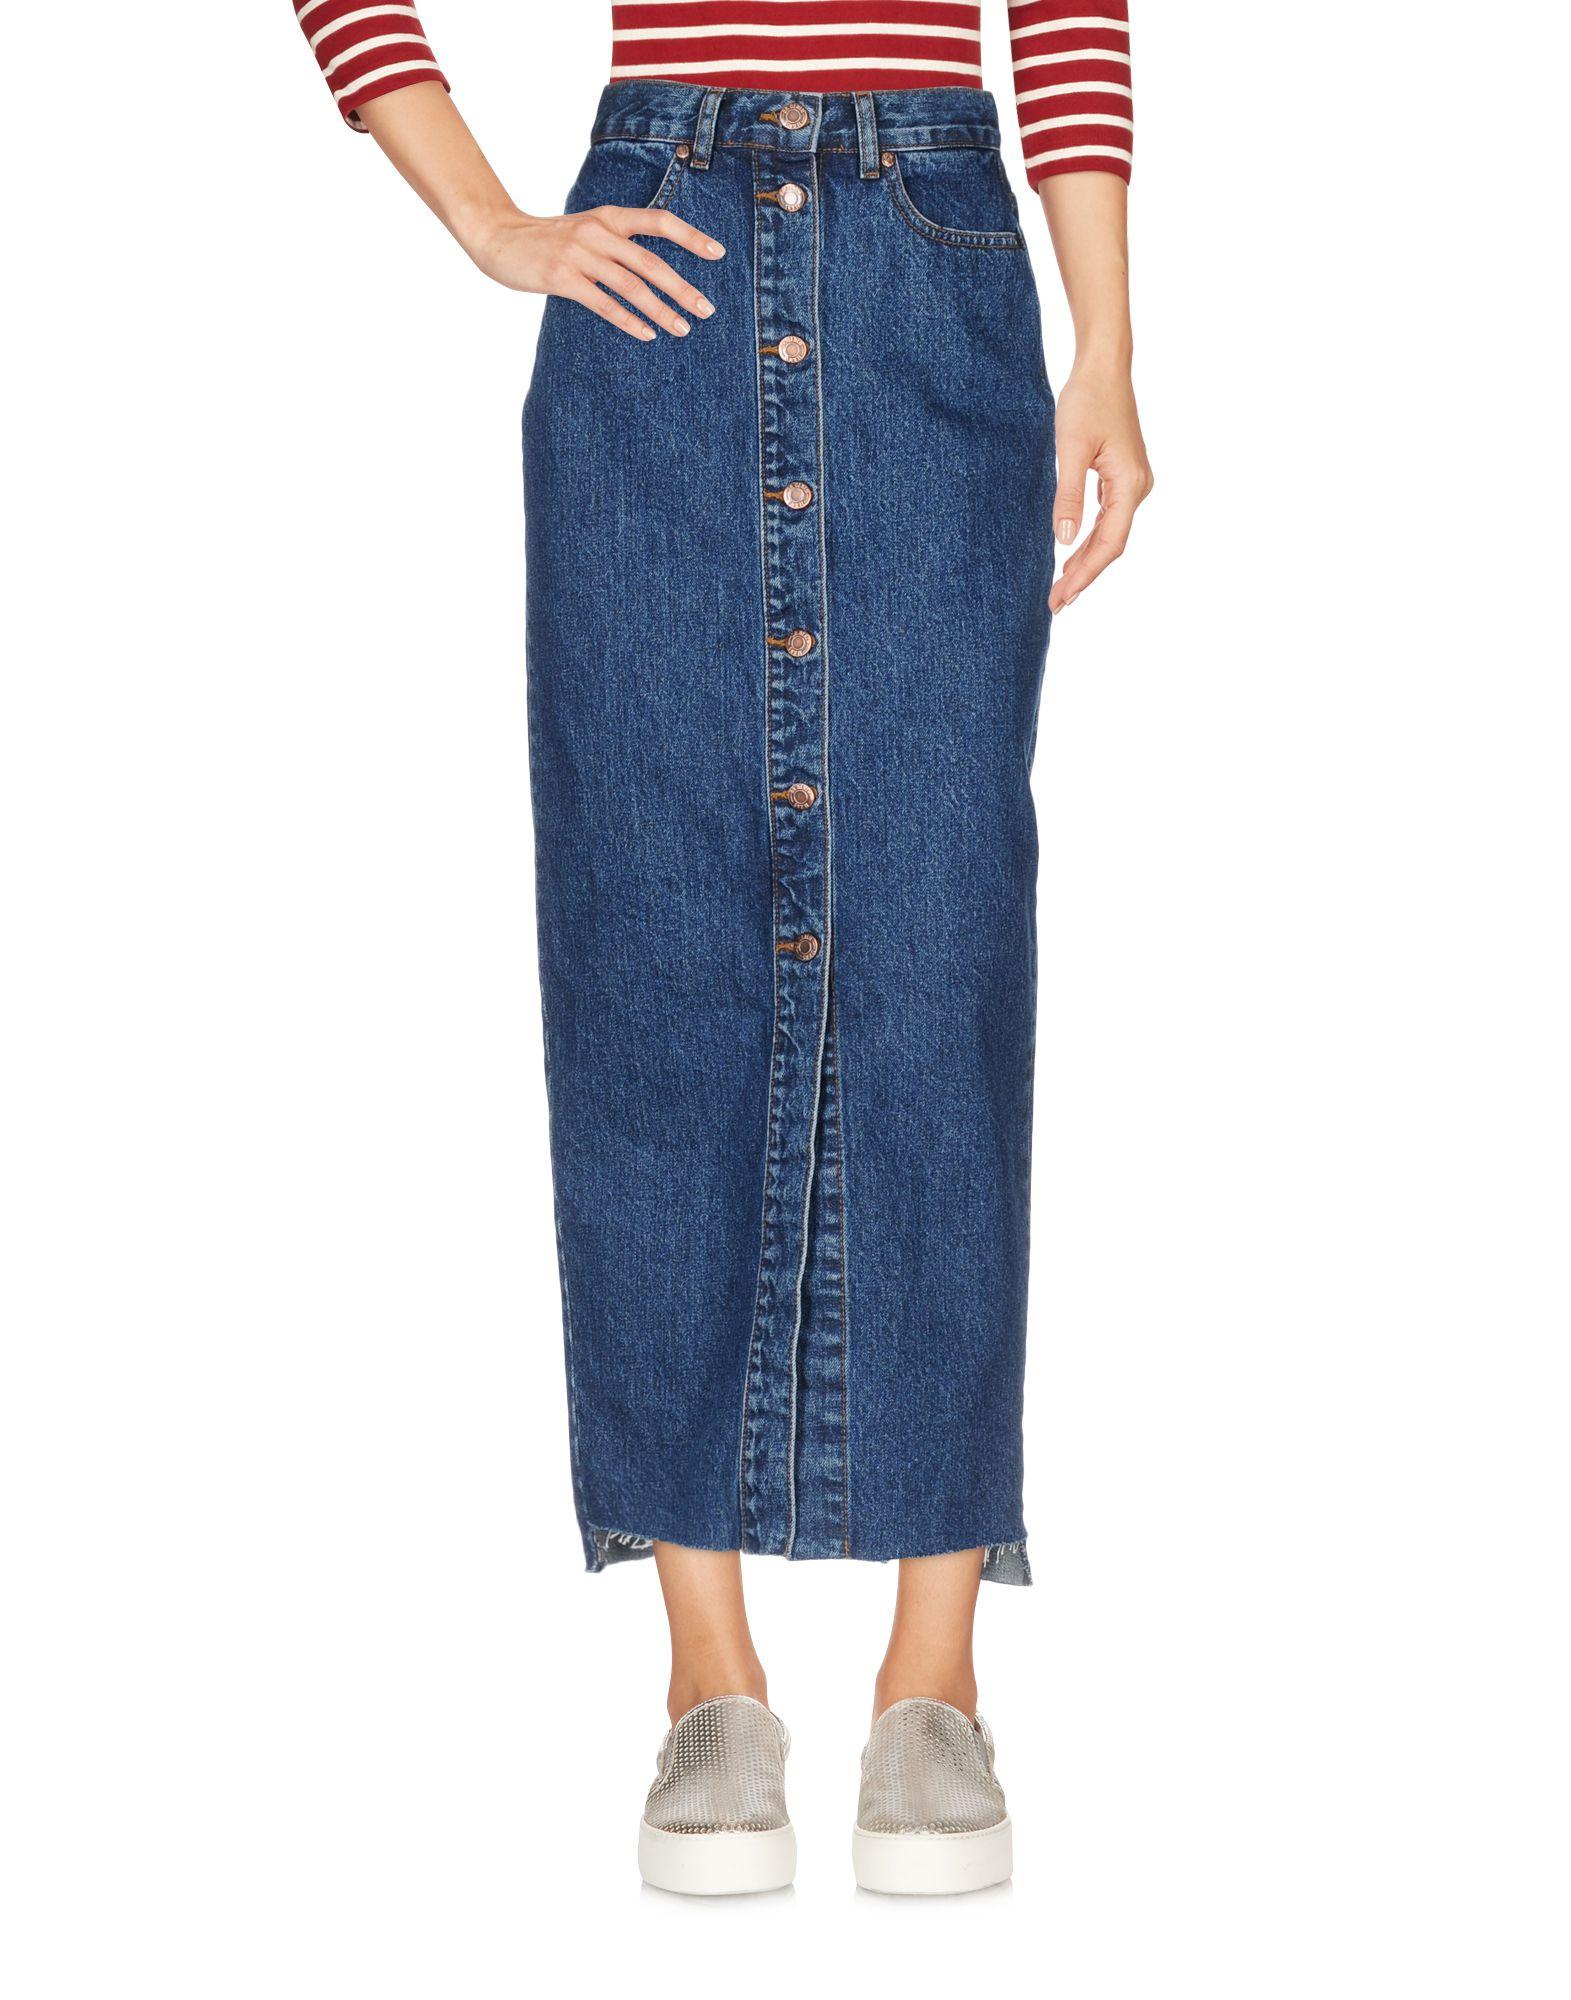 цена DR. DENIM JEANSMAKERS Джинсовая юбка онлайн в 2017 году